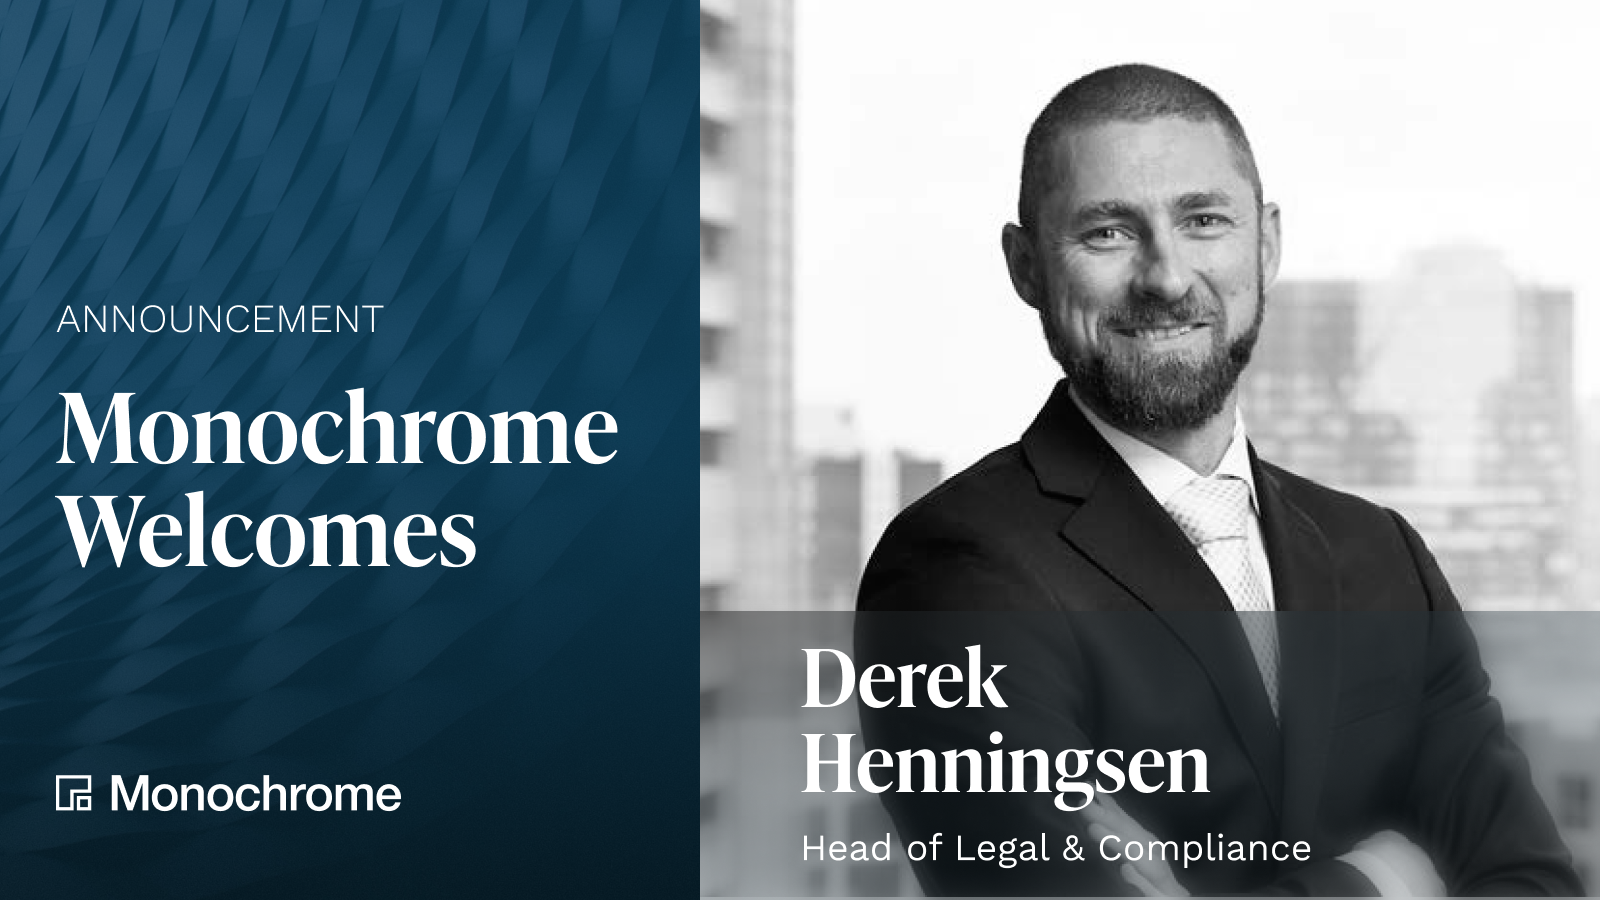 1600x900_Monochrome Asset Management_Derek Henningsen_Head of Legal and Compliance_New Appointment Announcement.png